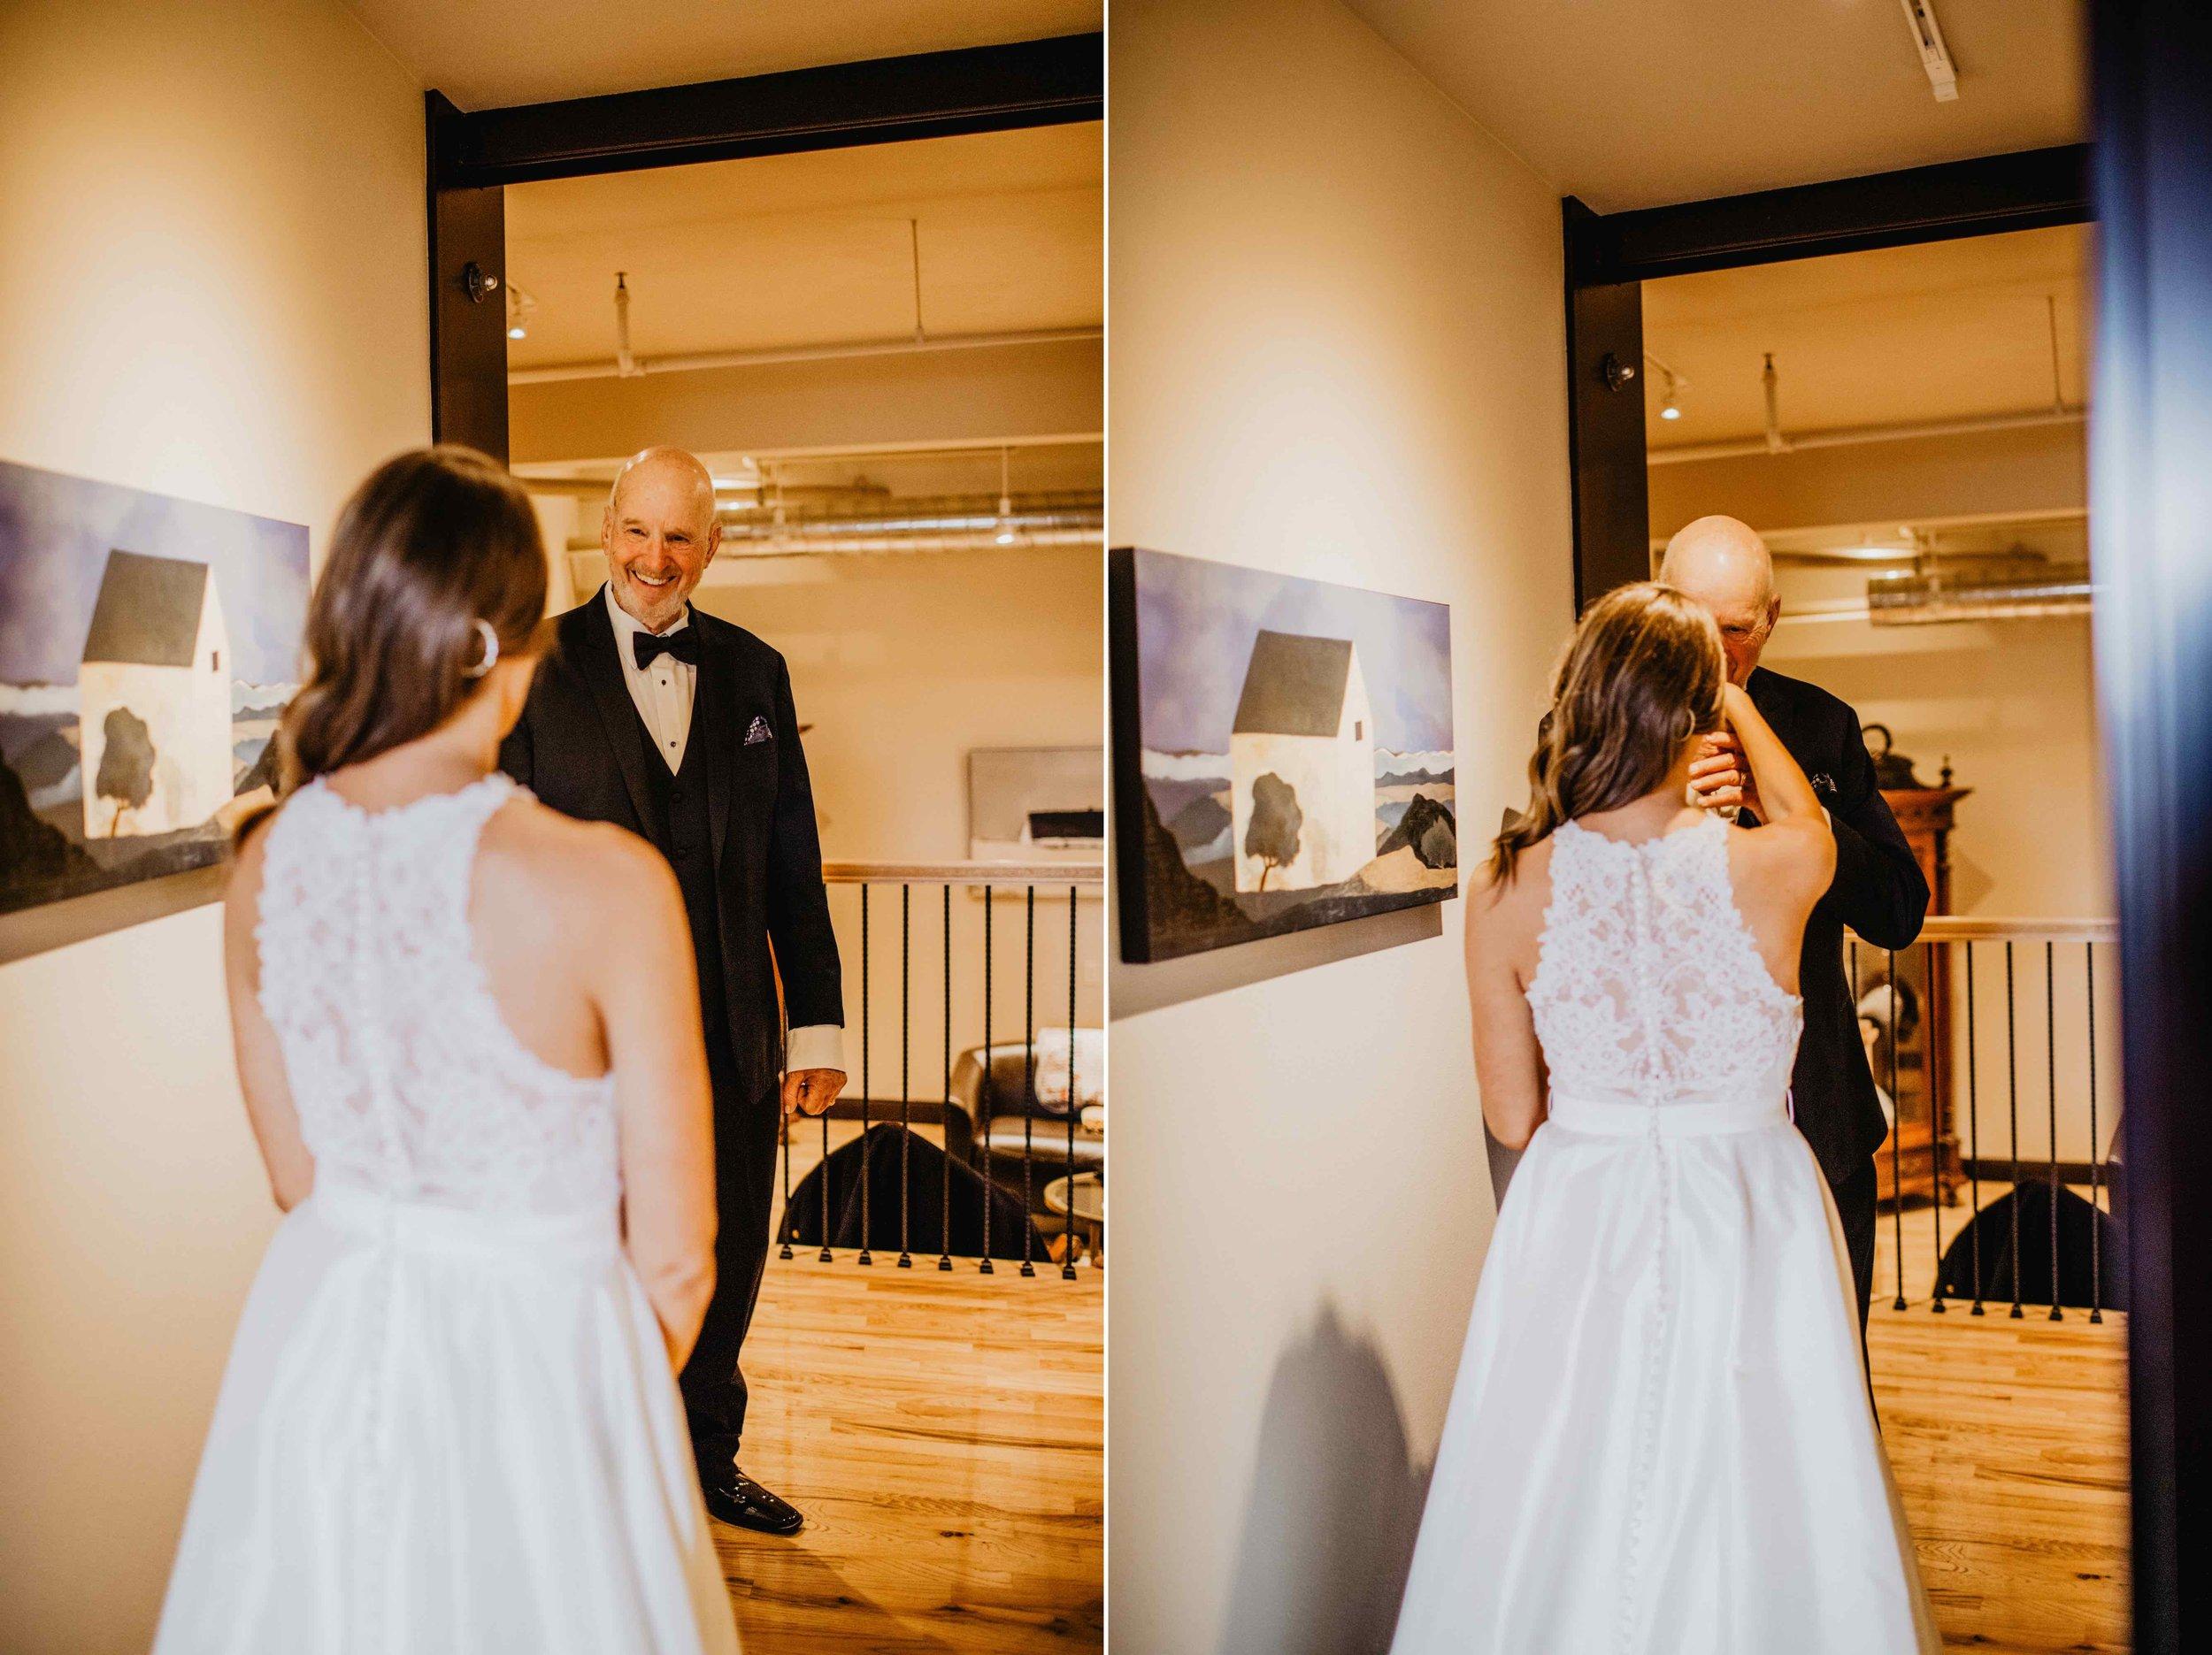 Kisa Conrad Favorites-0017-colorado-wedding-photographer-denver-springs-vailhotel-glenwood-springs-colorado-wedding-photographer.jpeg